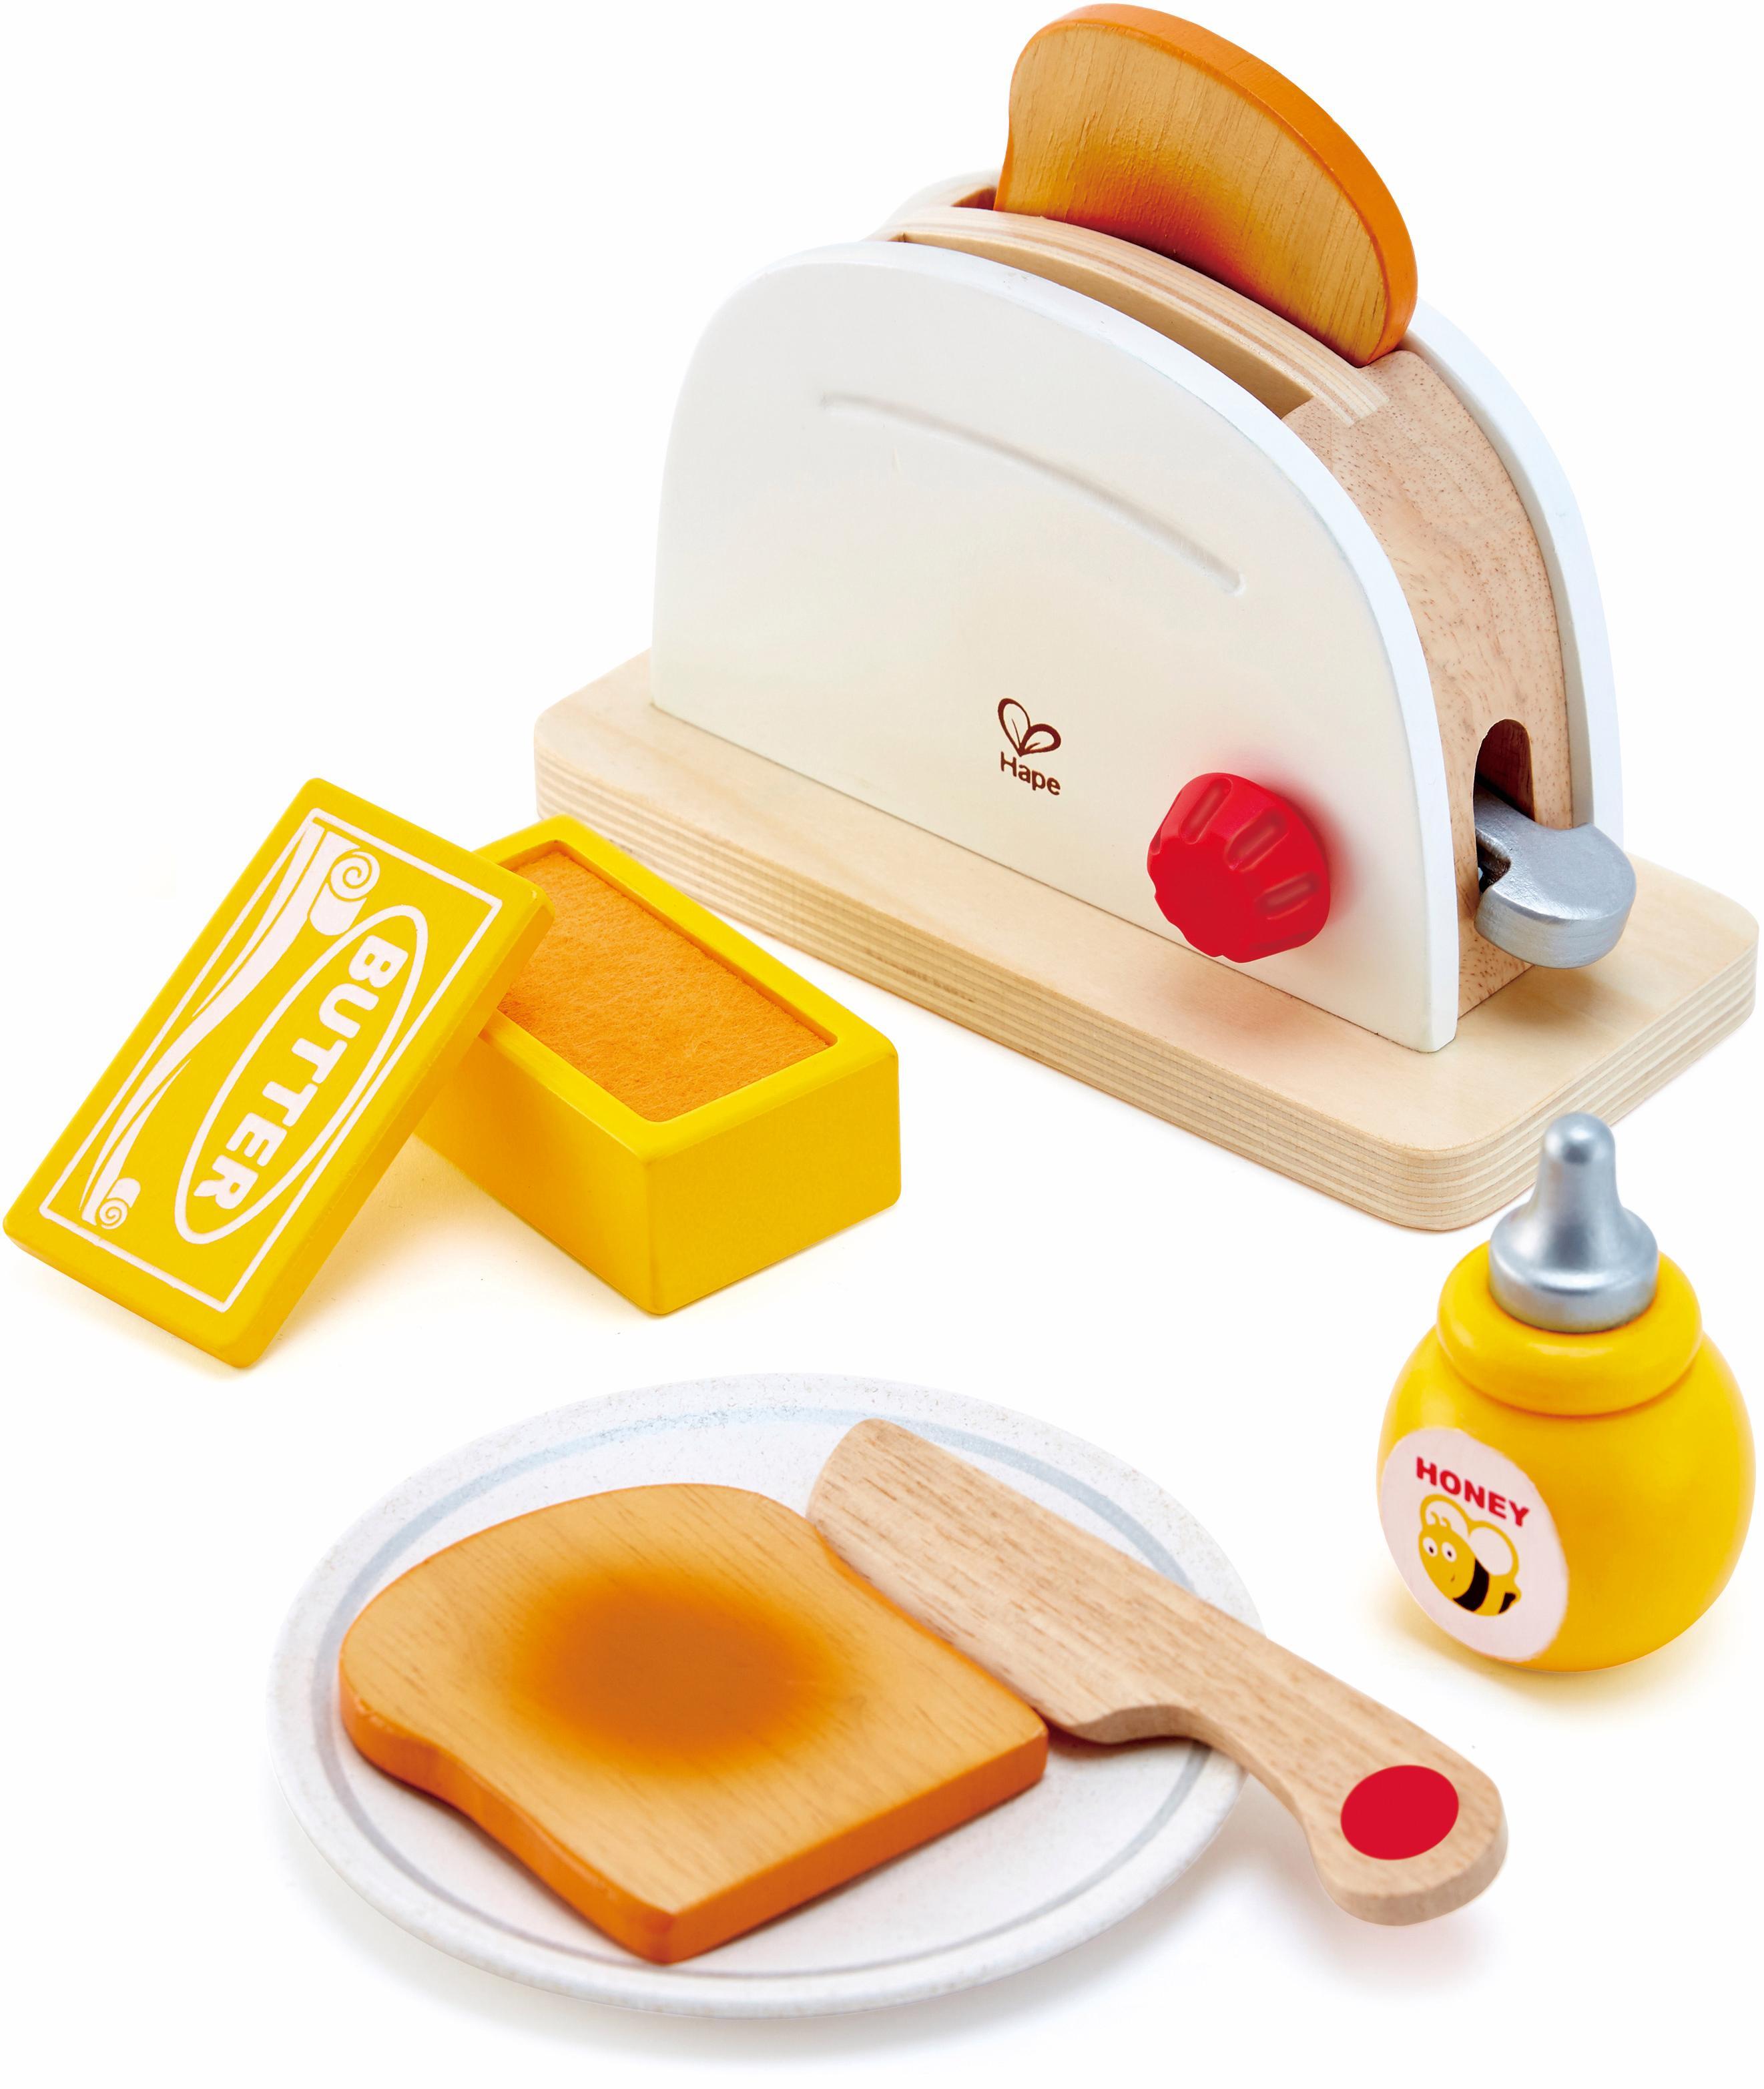 Hape Kinder-Toaster Pop-Up-Toaster-Set, 7-tlg. (Set, 7-tlg.) beige Kinder Kinderküchen Zubehör Kaufladen Spielzeug-Haushaltsgeräte